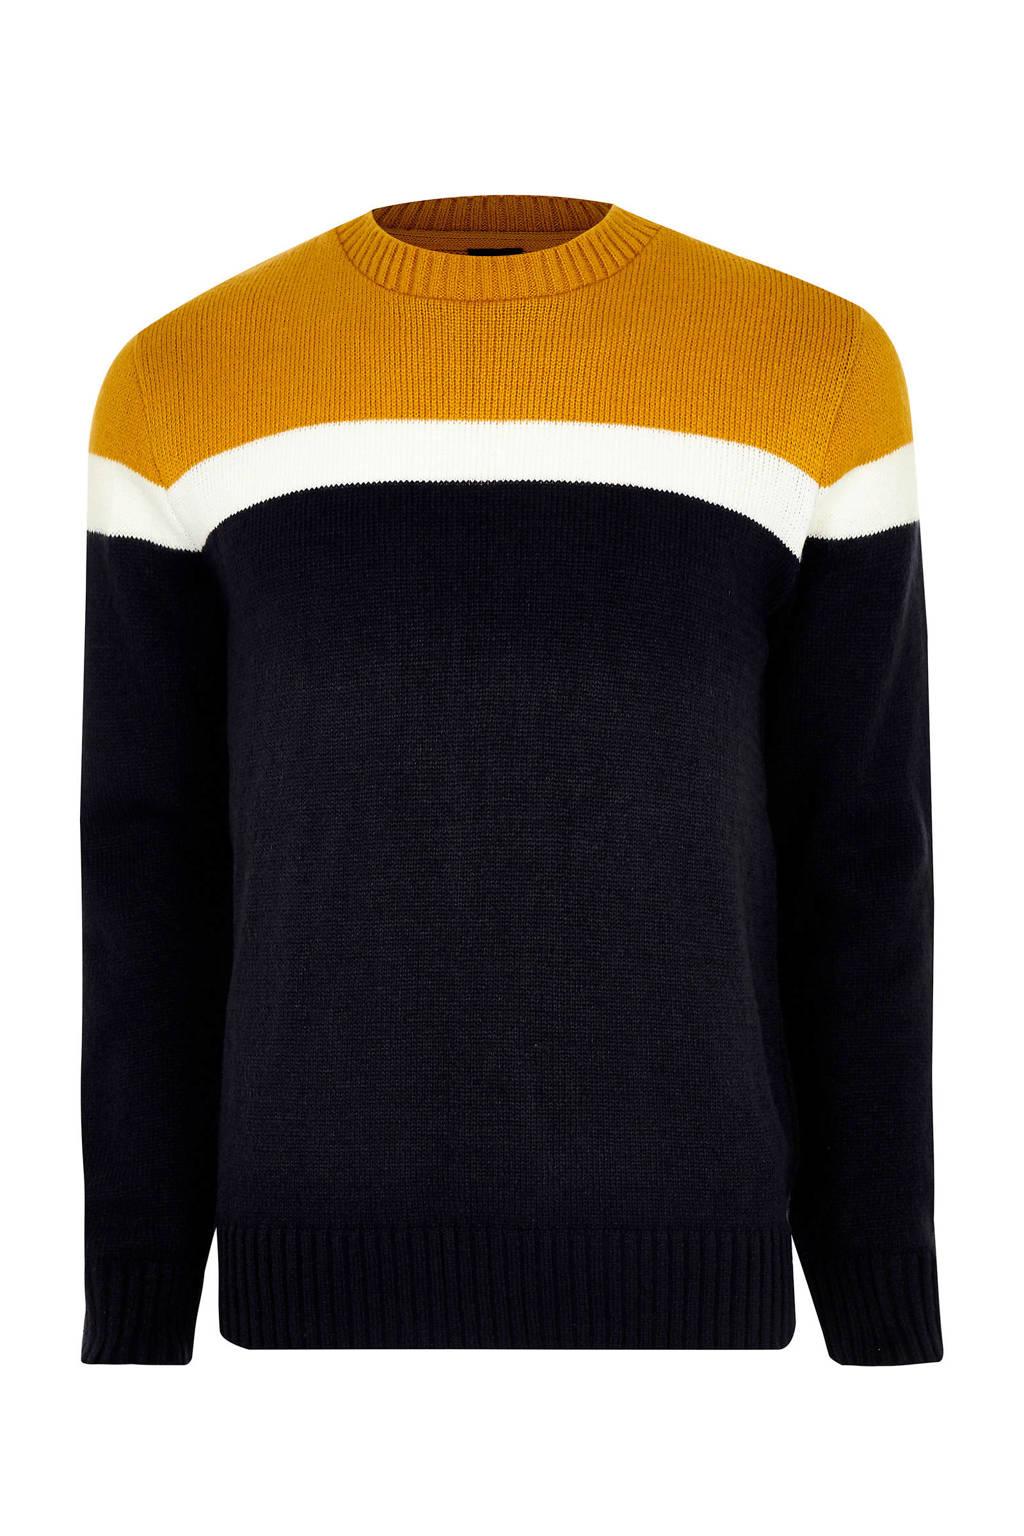 River Island trui, Zwart/geel